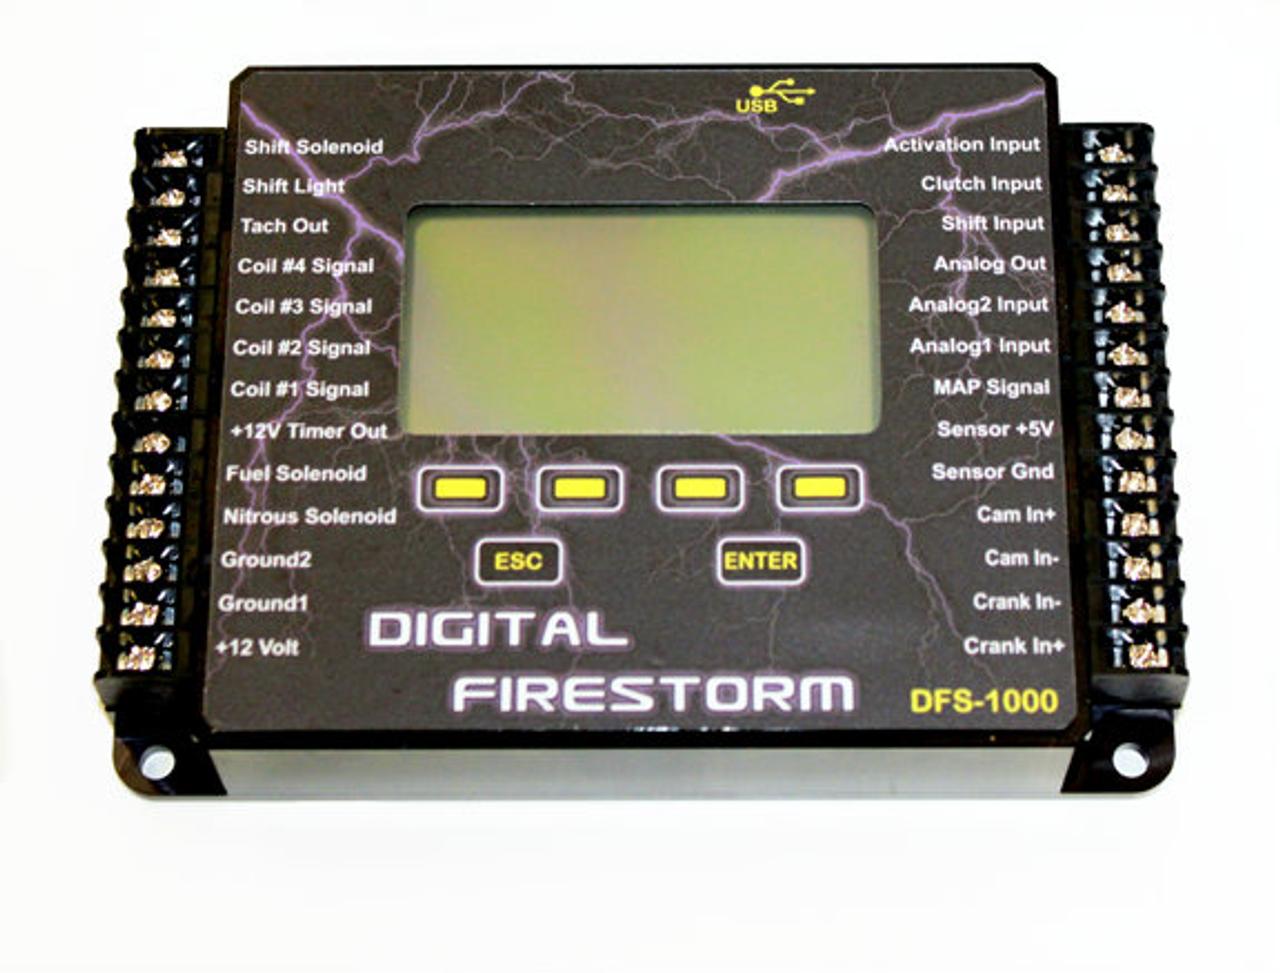 Firestorm 2__78029.1347378068?c=2 digital firestorm ignition progressive nitrous controller aem fuel ignition controller wiring diagram at webbmarketing.co